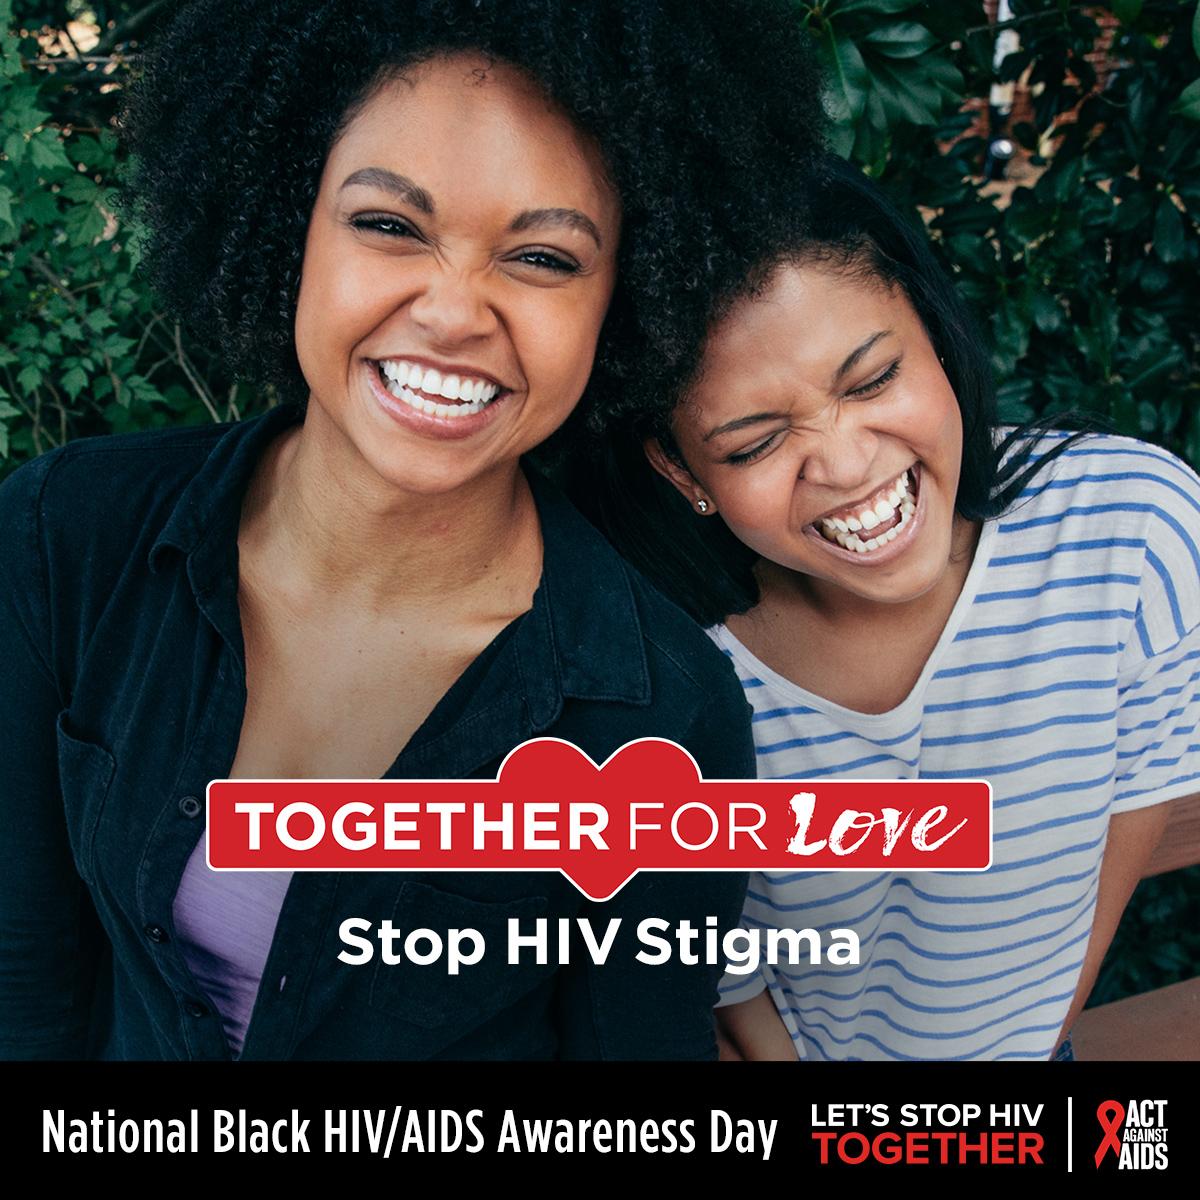 Together for love : stop HIV stigma